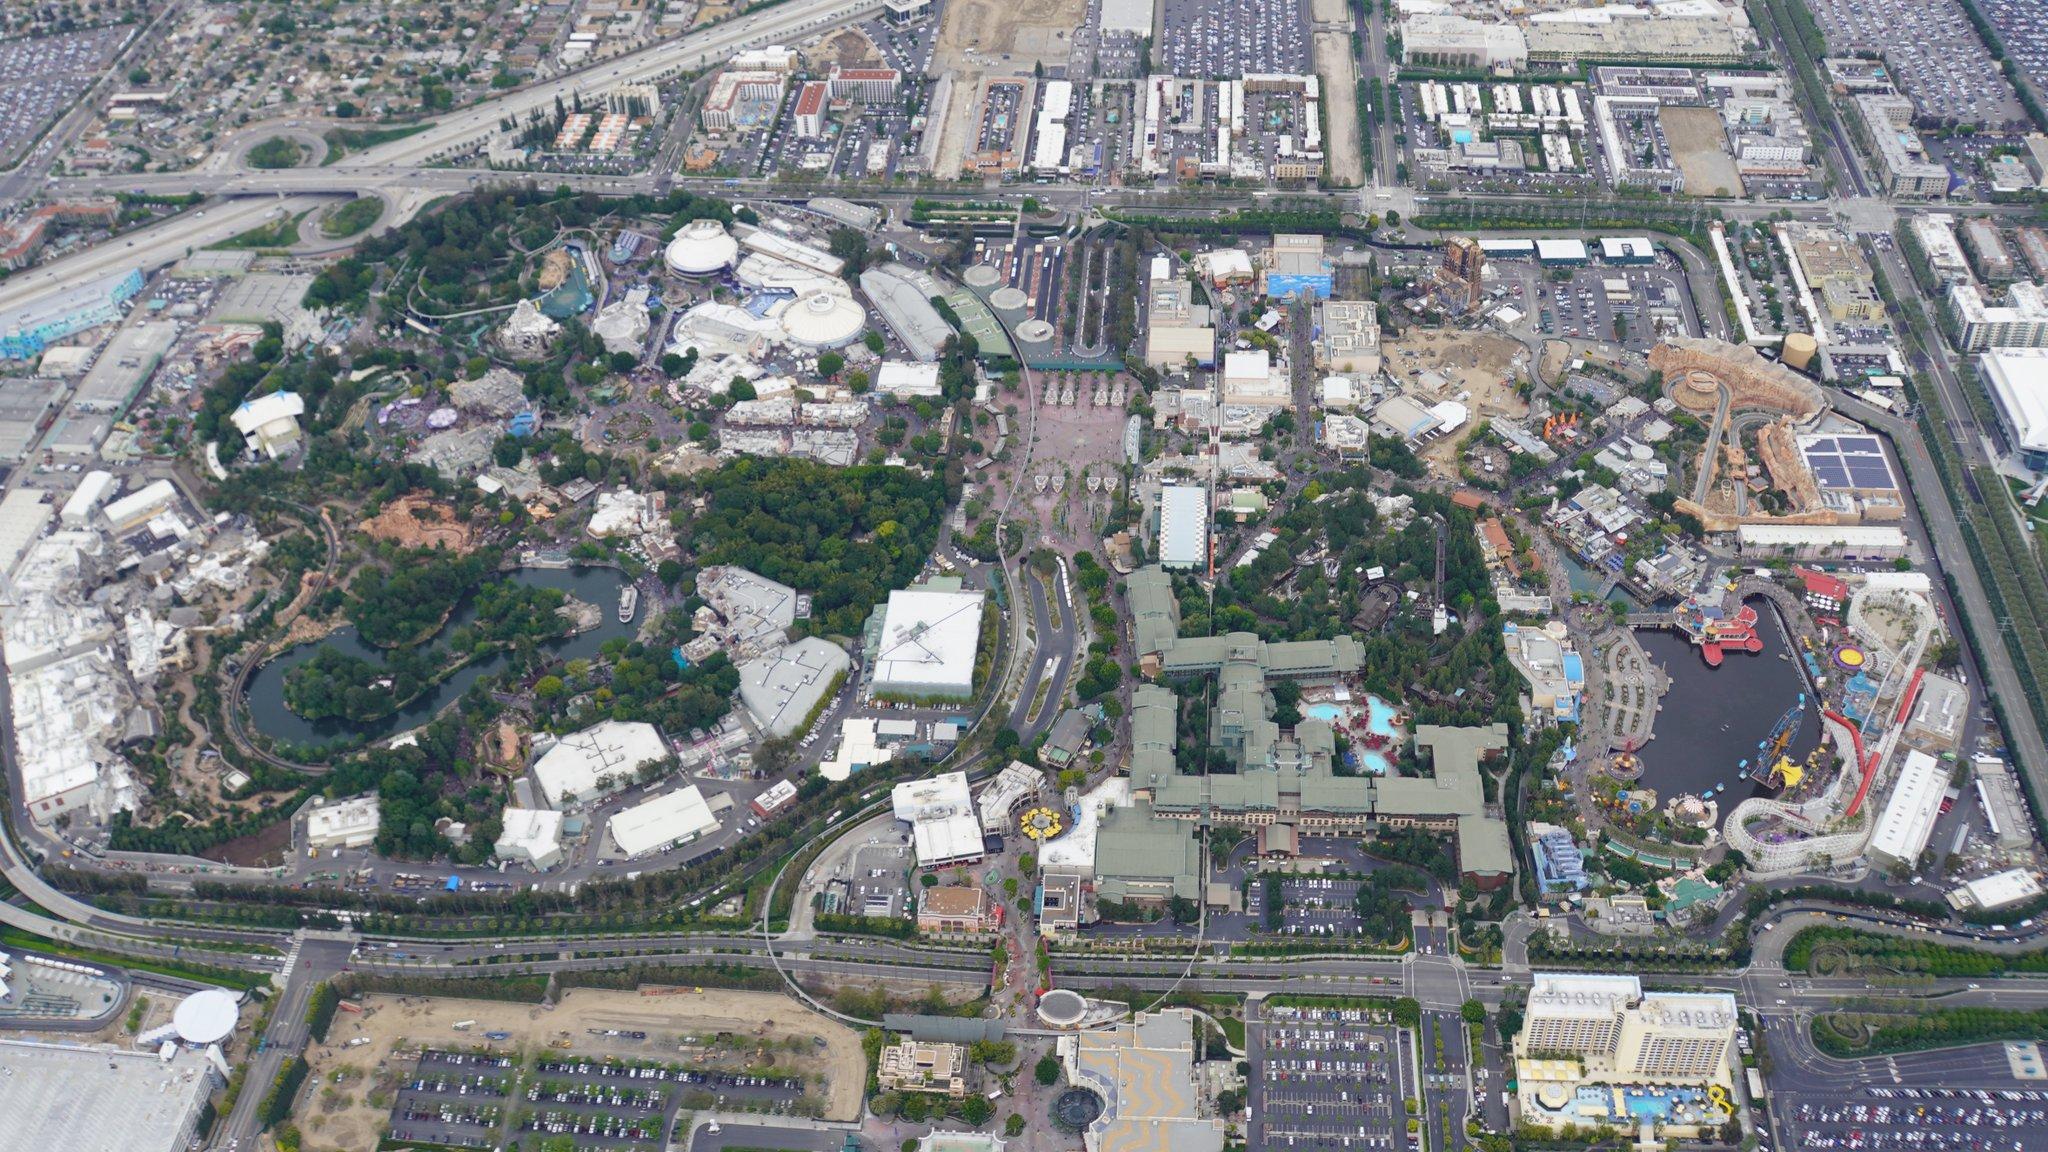 Disneyland Resort vu du ciel, des images sublimes! D6BJZO4UYAA6UwU